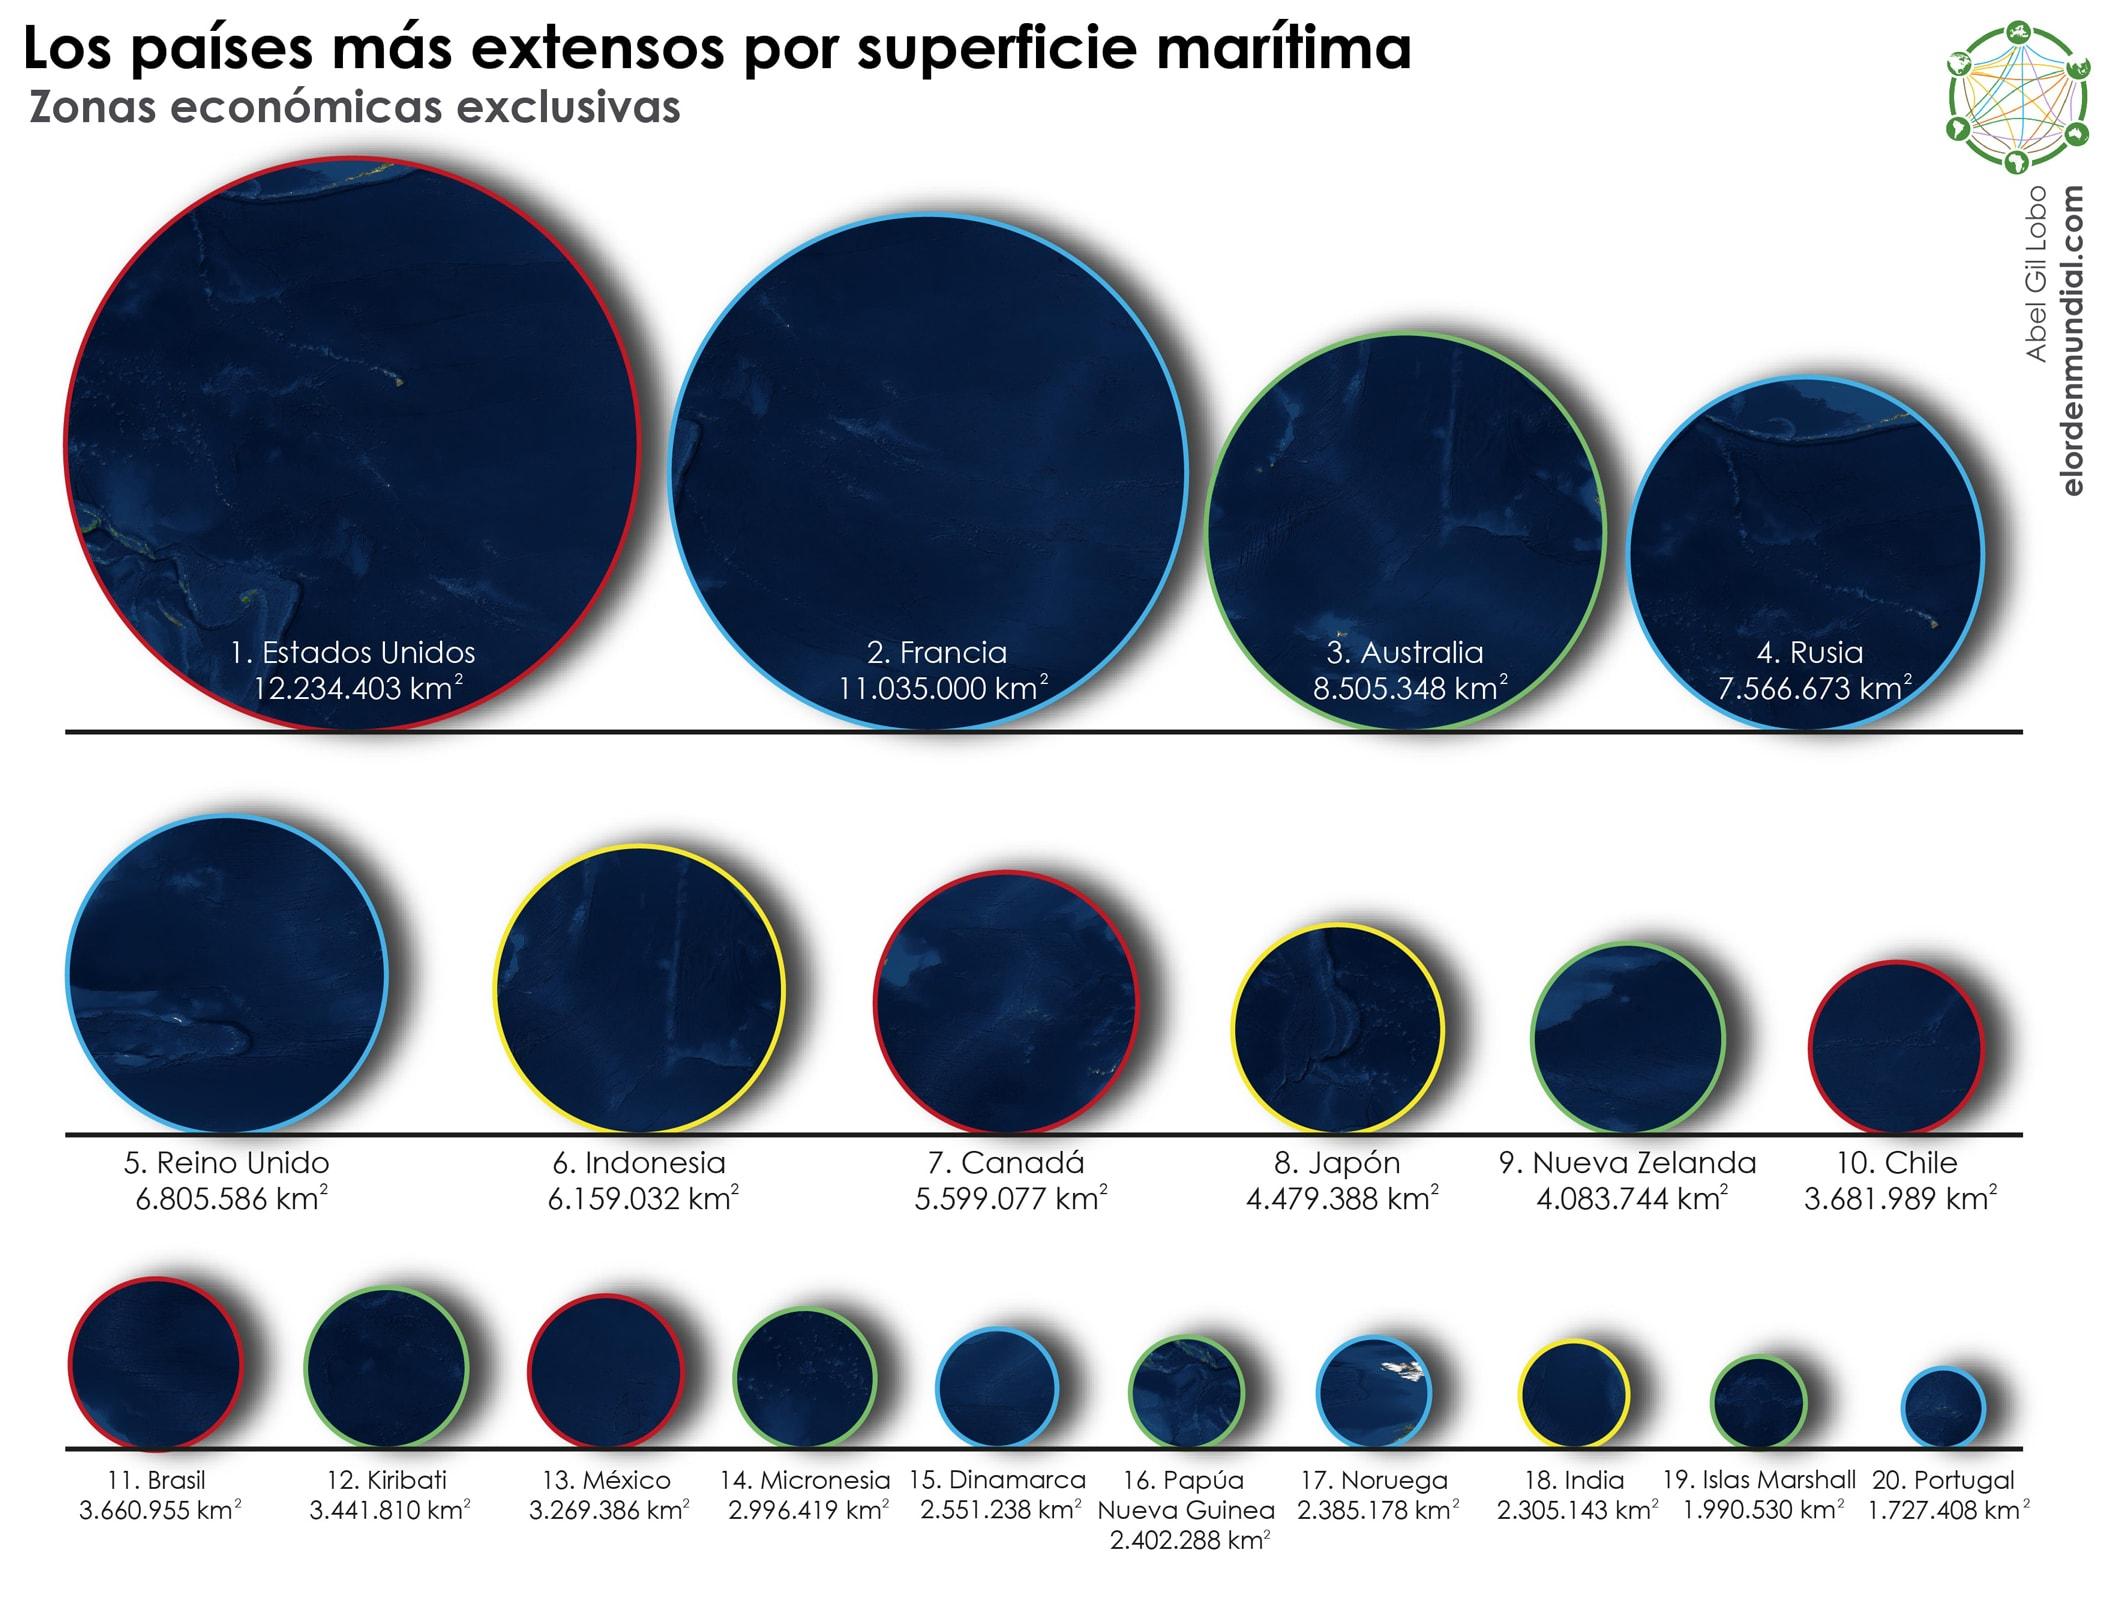 Gráfico Mundo ZEE Superficie Marina Marítima Ránking Tamaño Extensión Aguas Territoriales